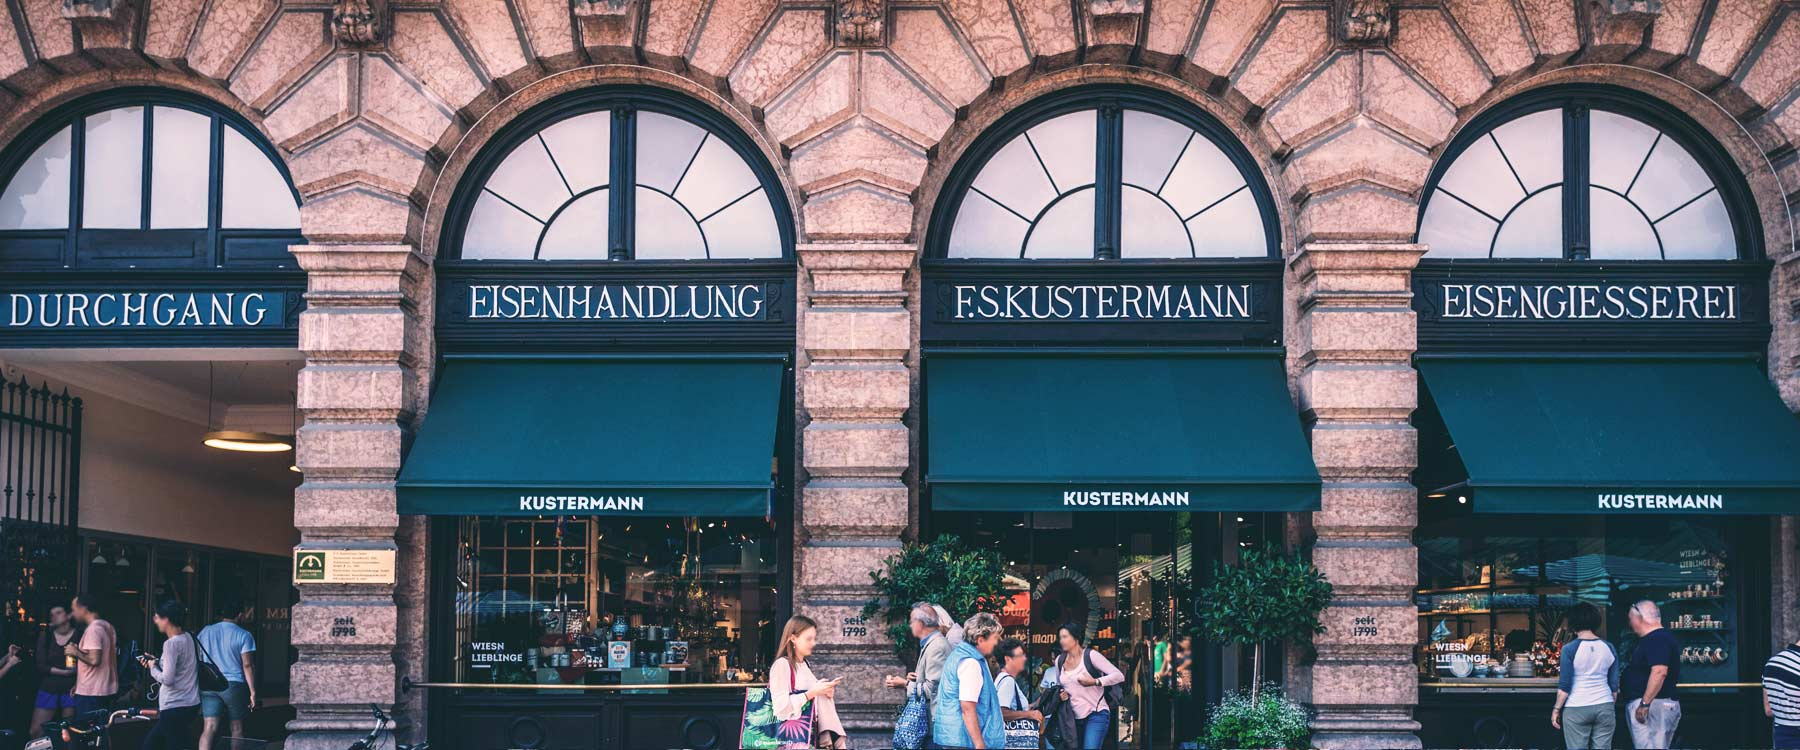 Kustermann